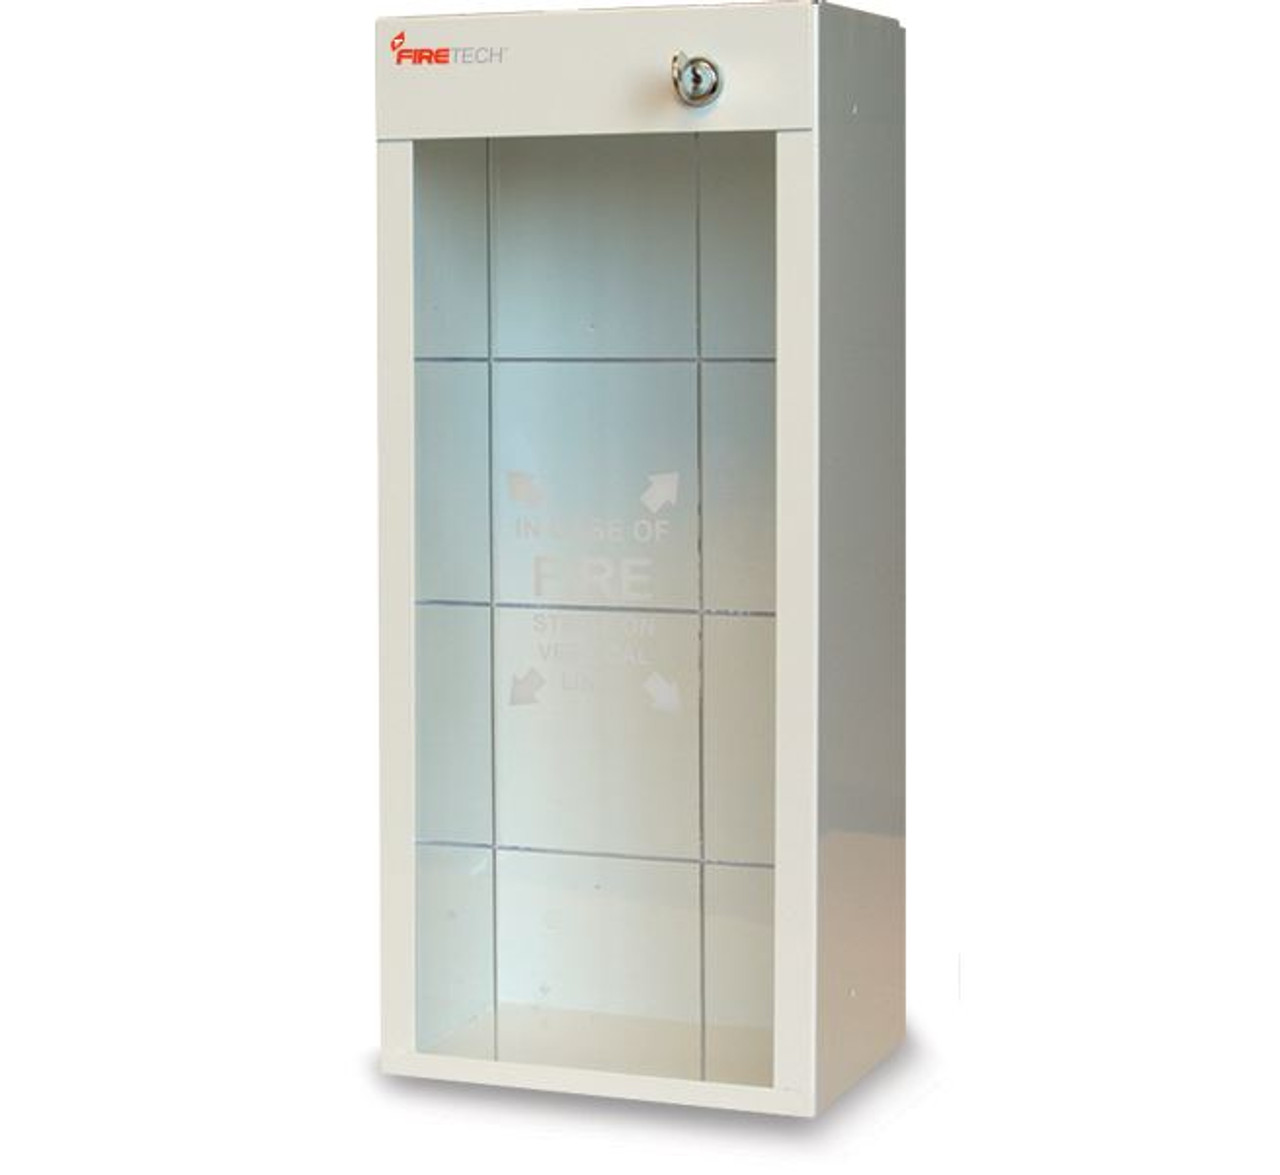 FT916 - Short FireTech Metal Extinguisher Cabinet